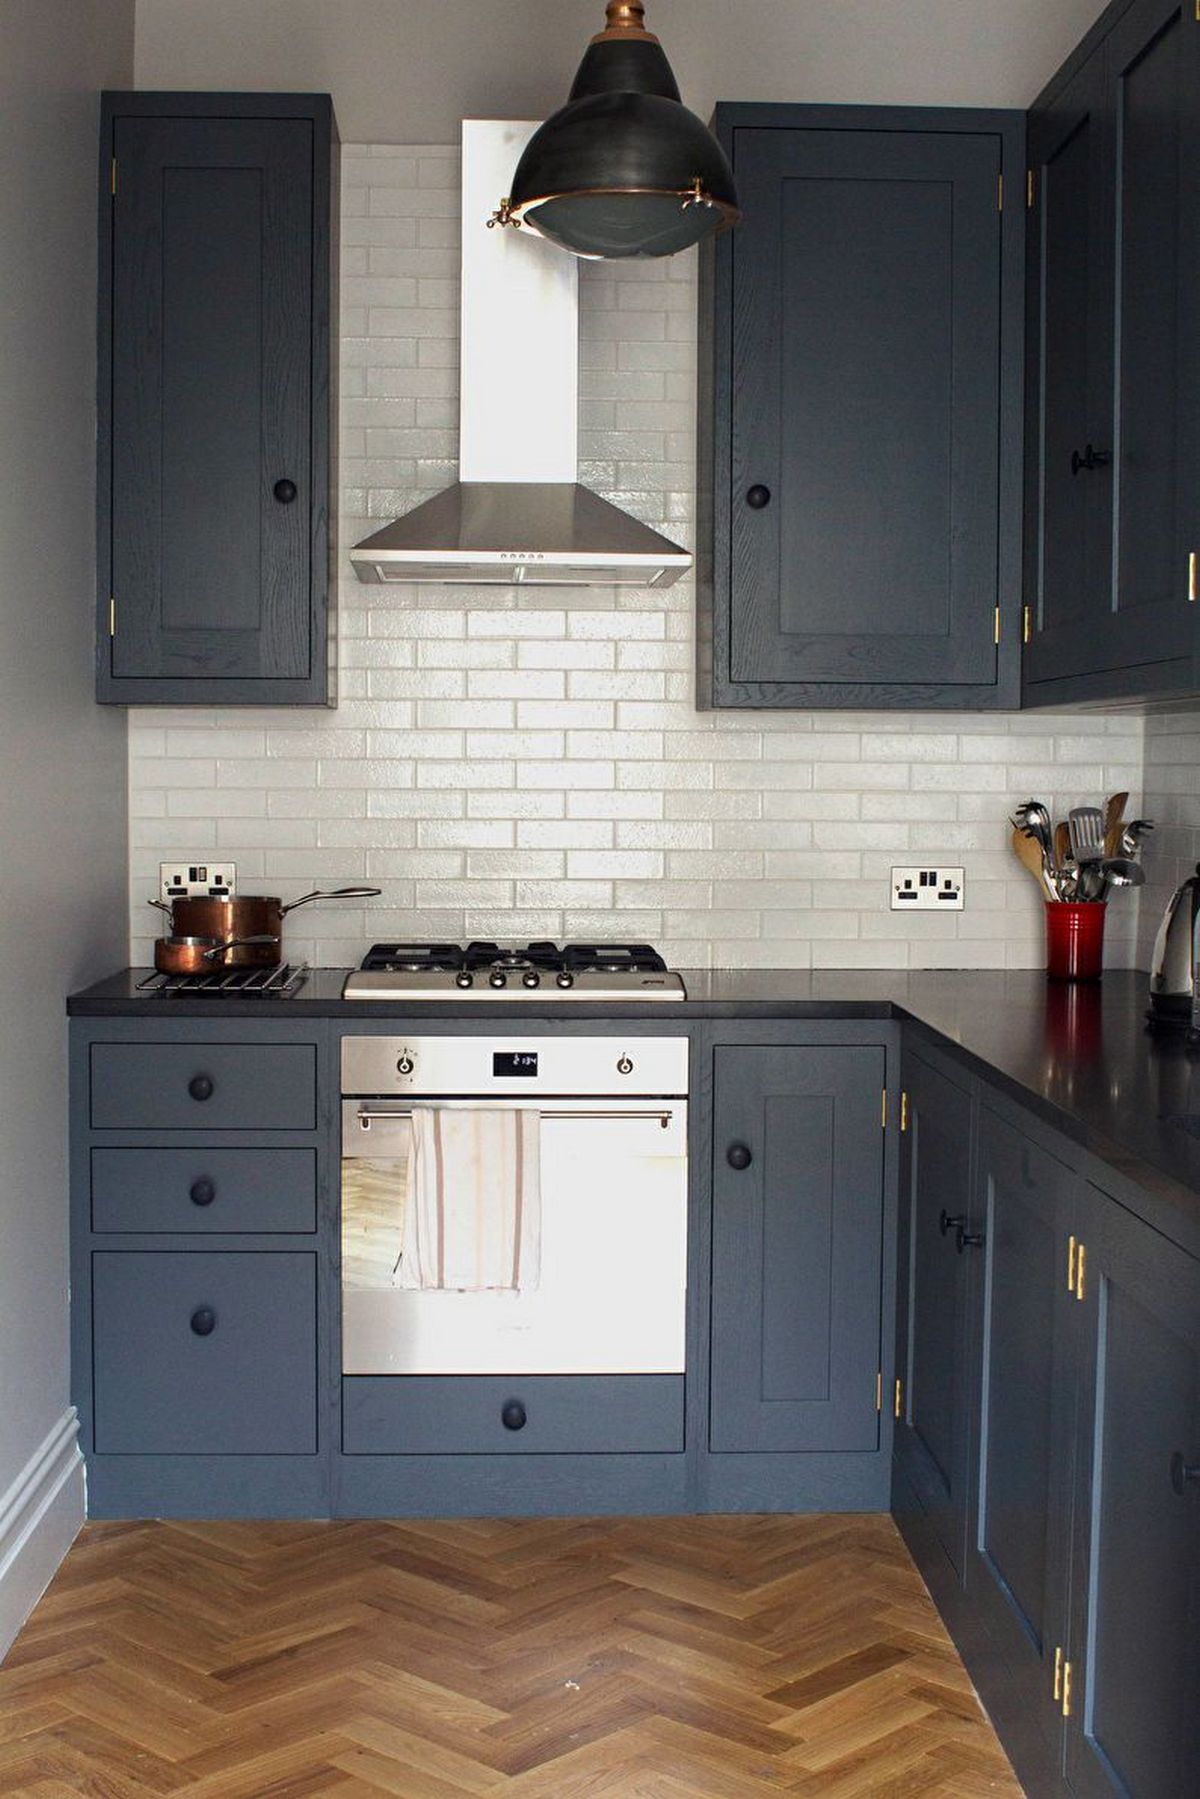 дизайн кухни 6 кв м фото новинки интересный гарнитур